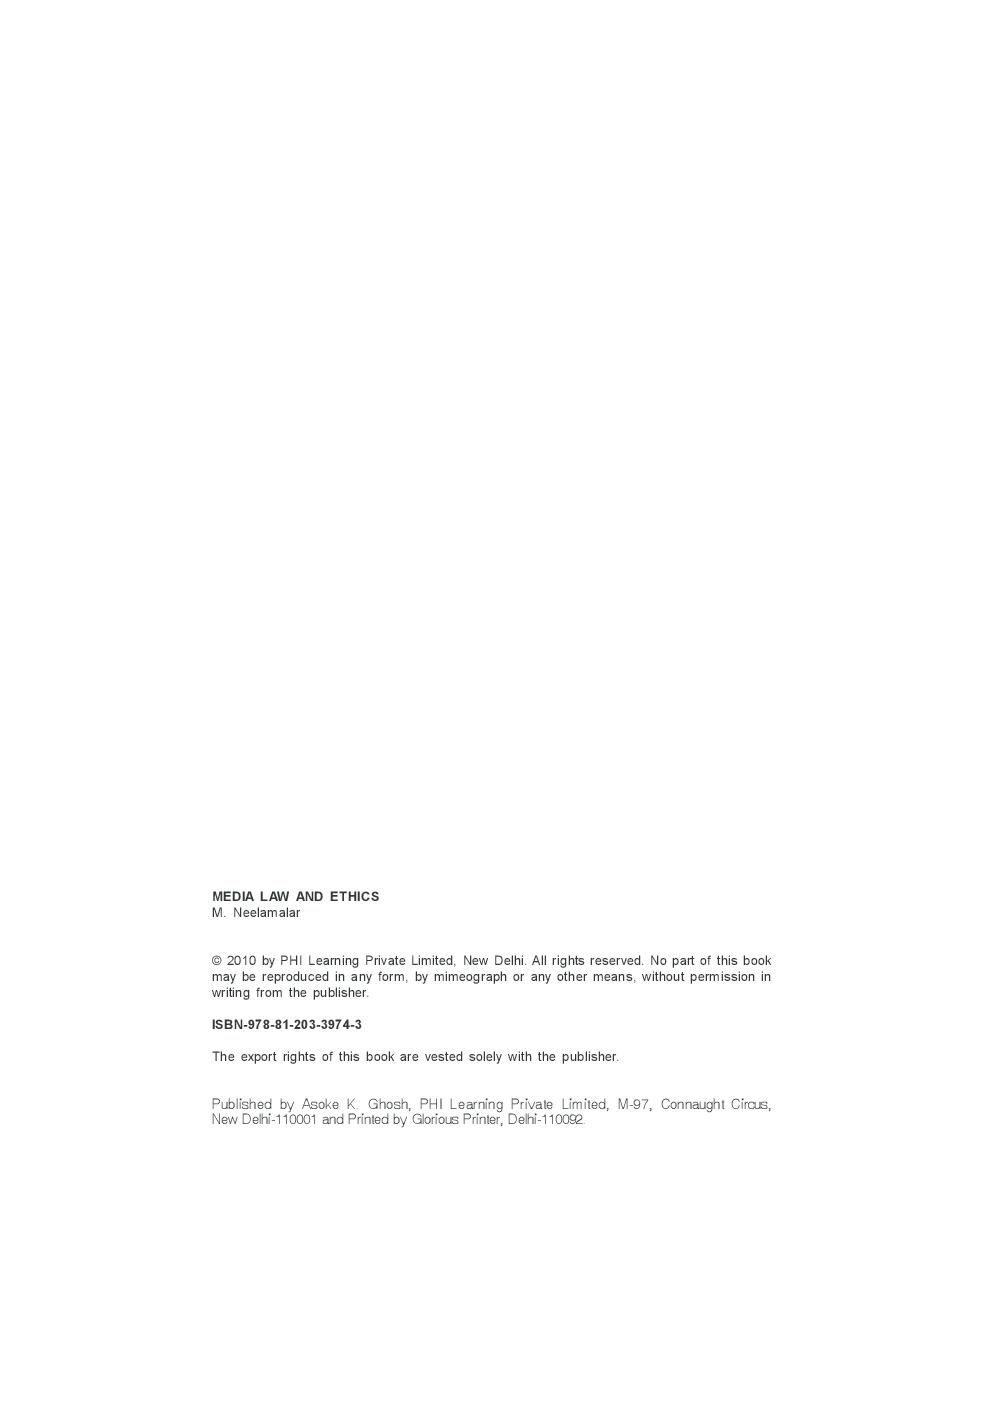 download lunda geometry: mirror curves, designs, knots, polyominoes, patterns, symmetries